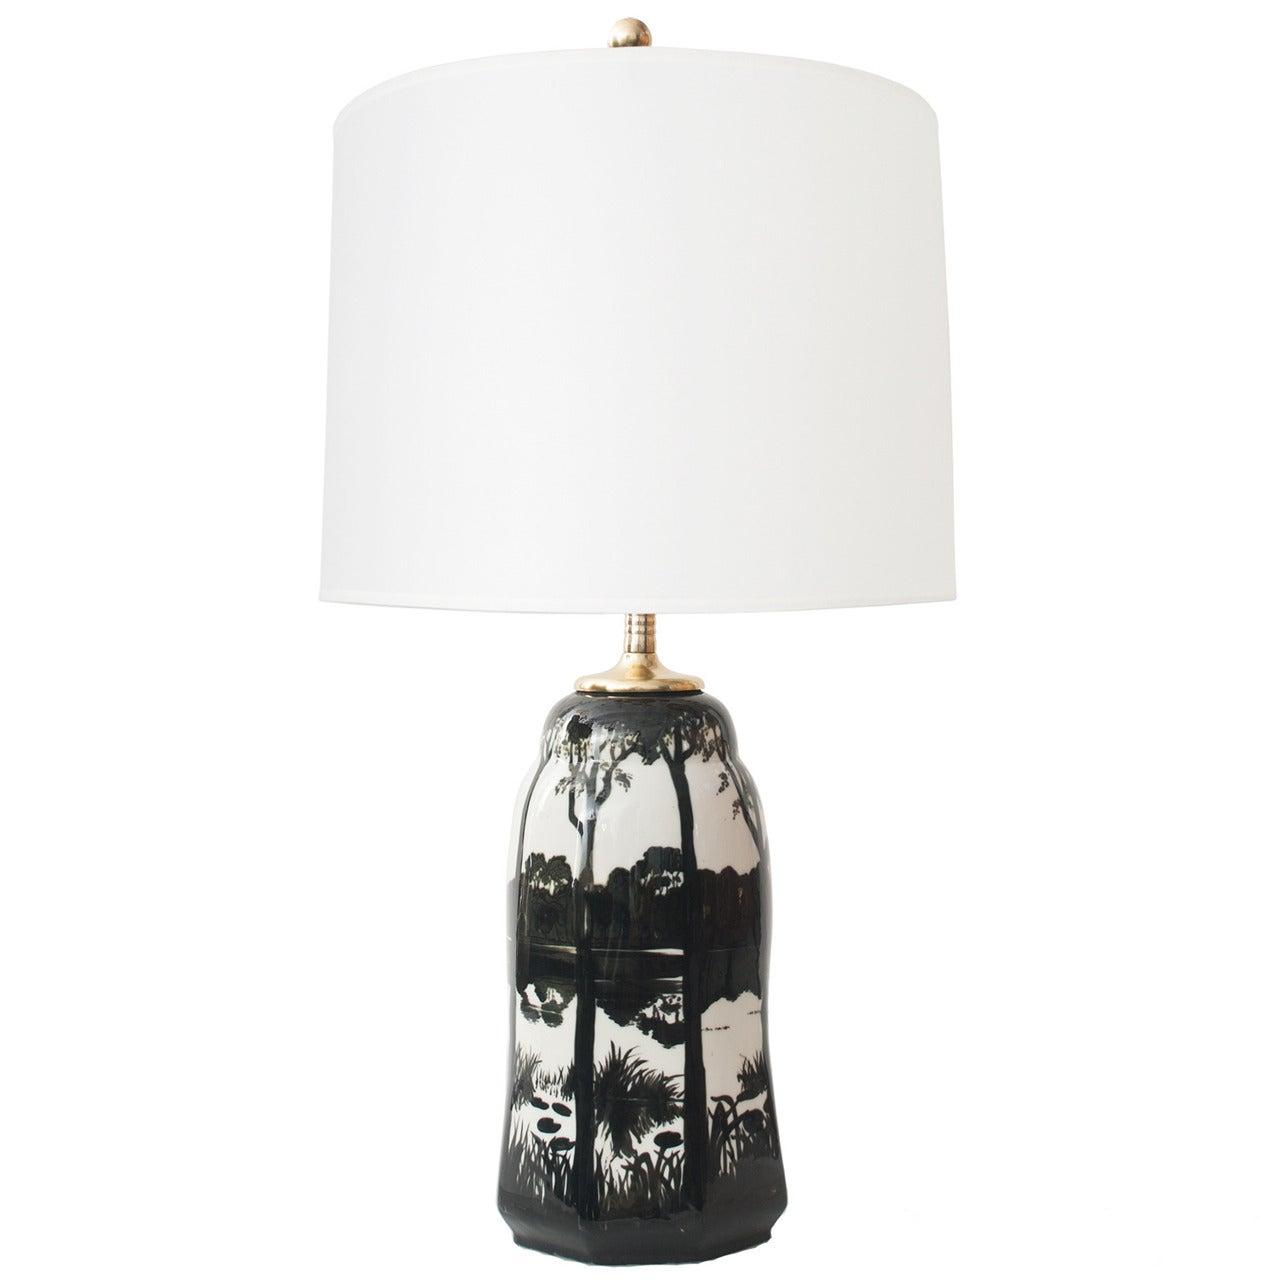 Swedish Ceramic Table Lamp by Knut Hallgren for ALP Lidköping